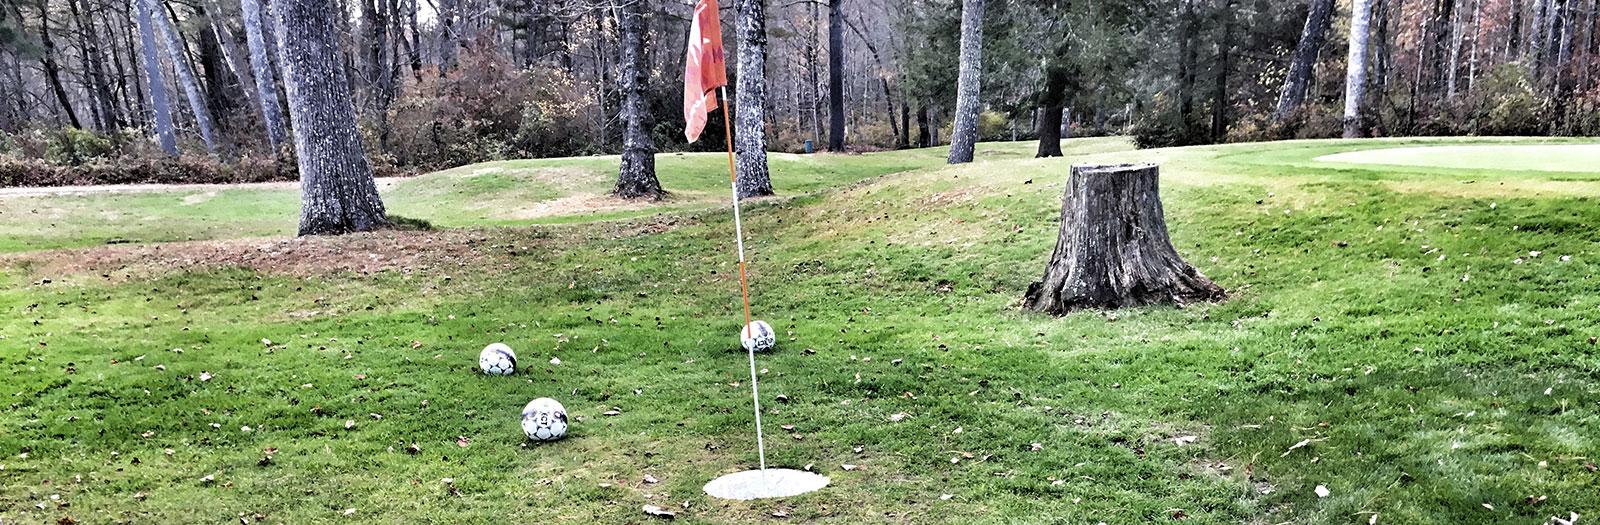 Photo of Red Bird Foot Golf